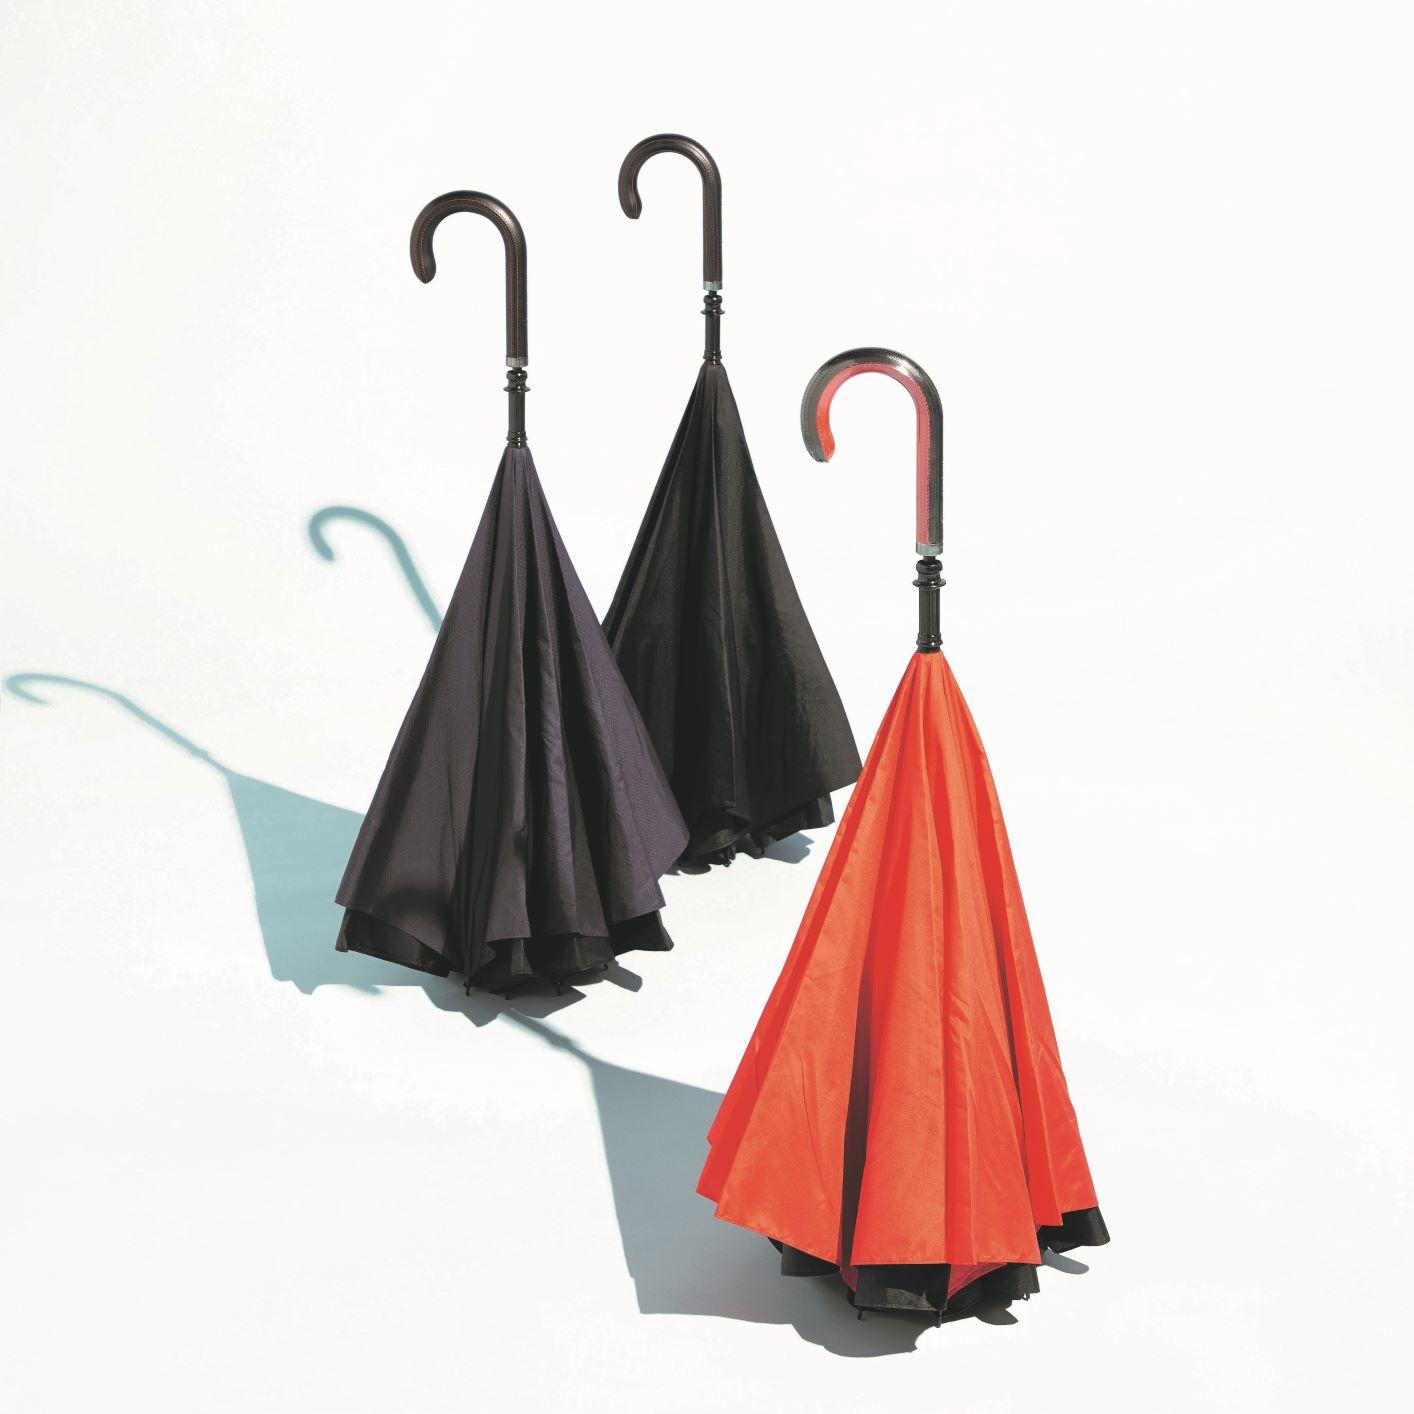 逆折り式傘(台湾・CARRY saKASA)(週刊新潮DM紹介)